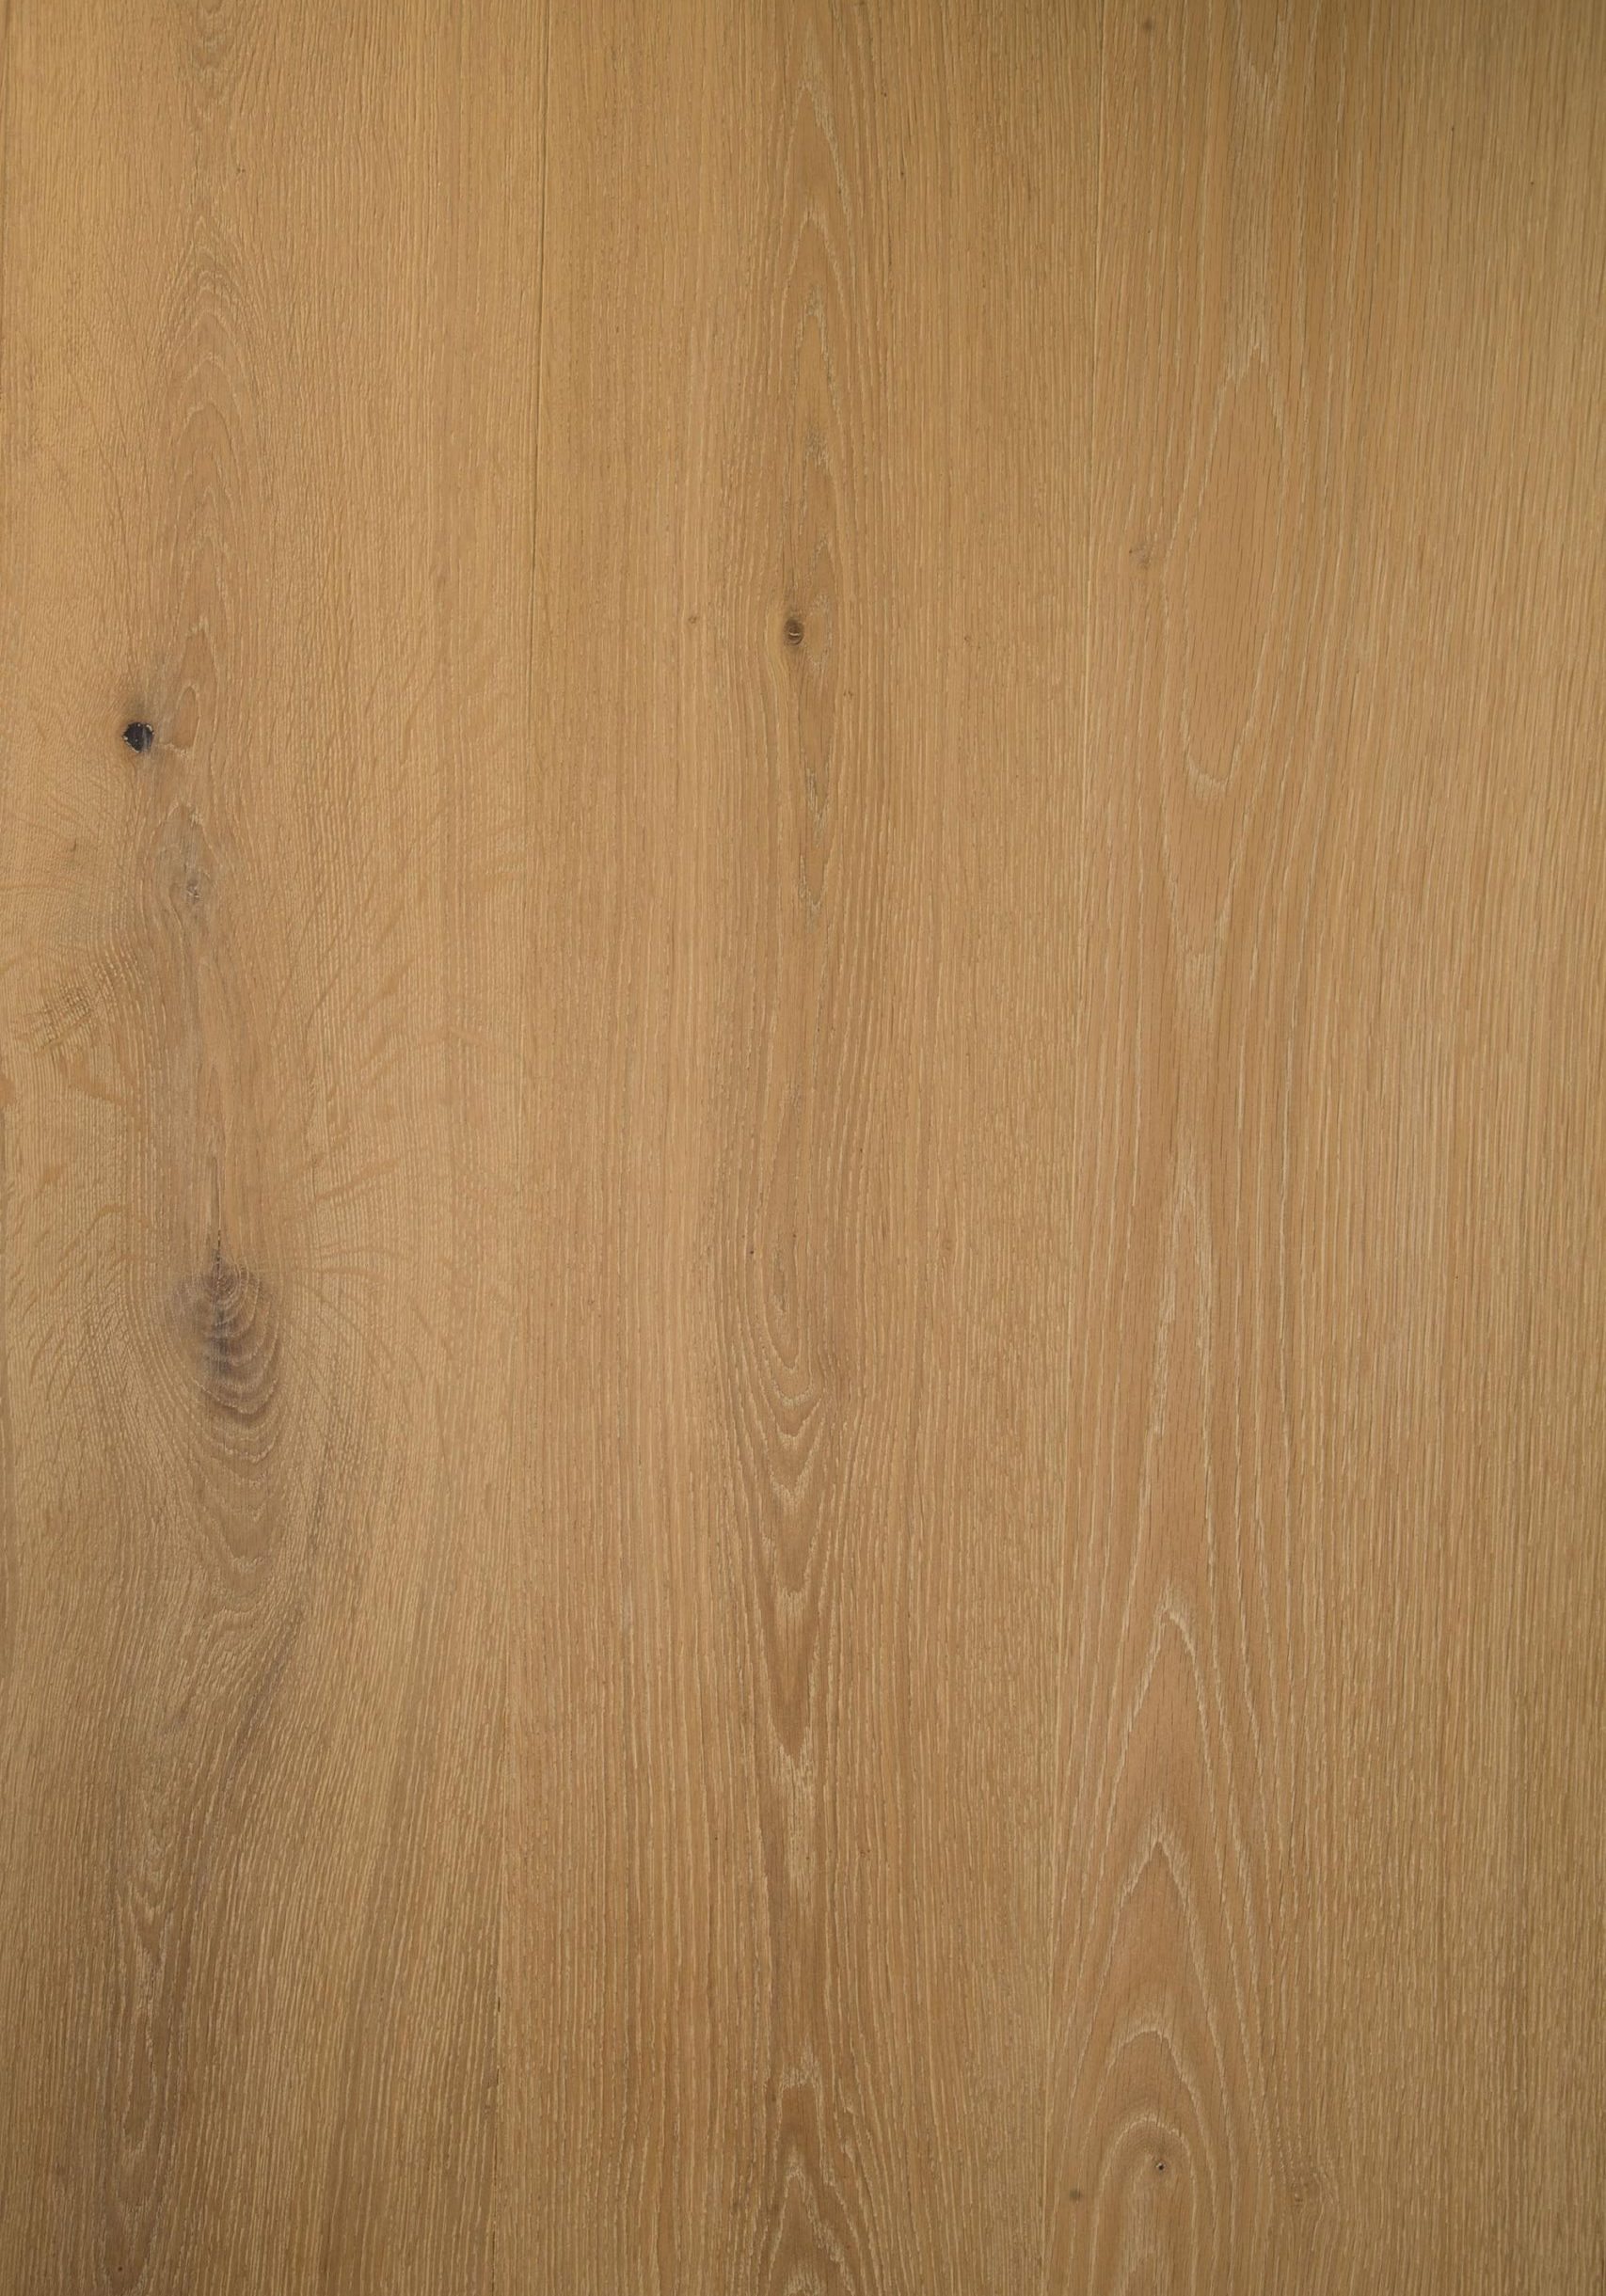 Glowood Timber Day